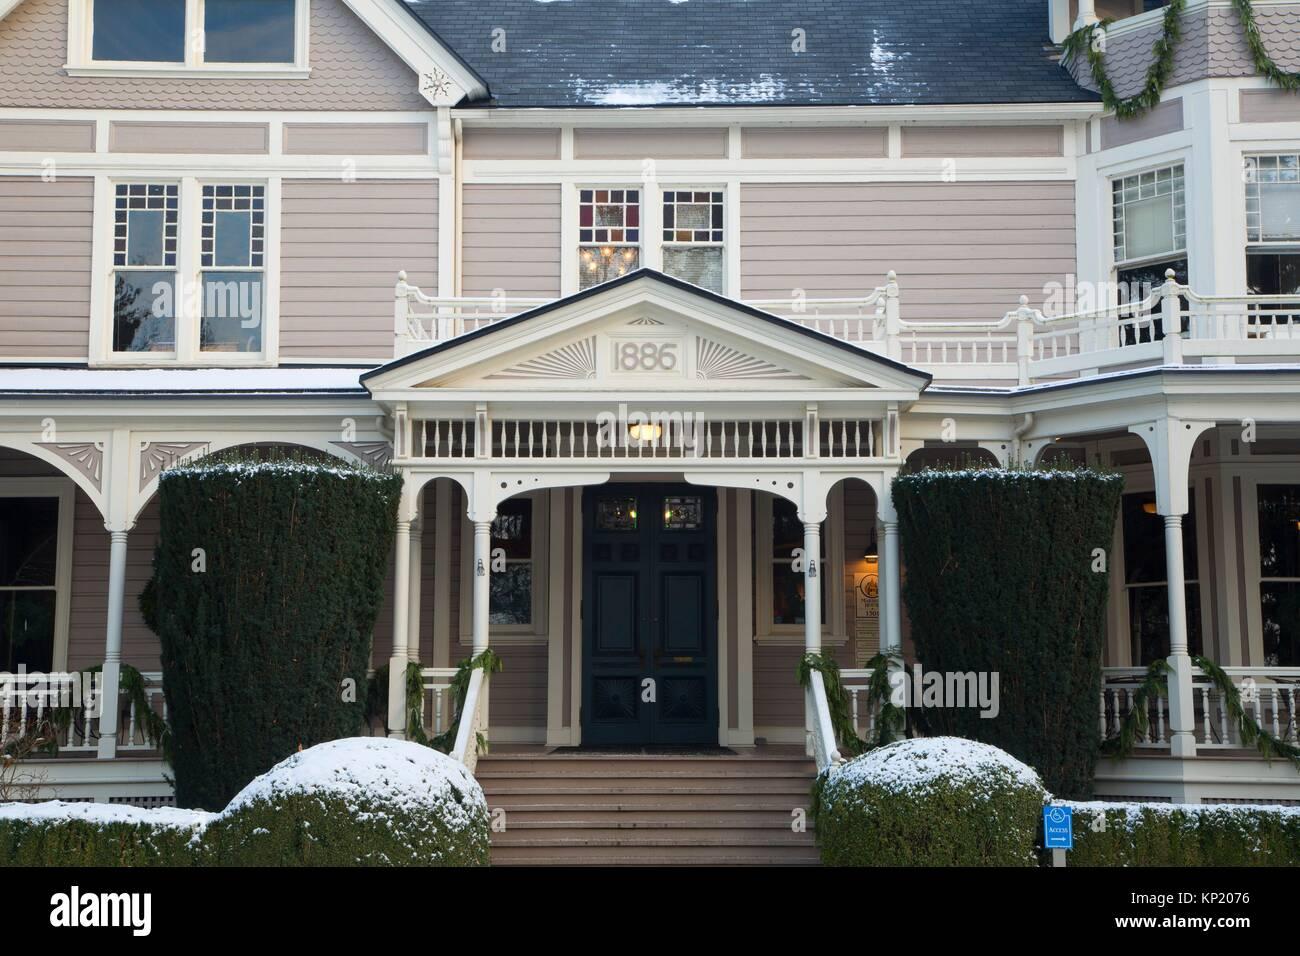 Marshall House, Fort Vancouver National Historic Site, Vancouver National Historic Reserve, Washington. - Stock Image